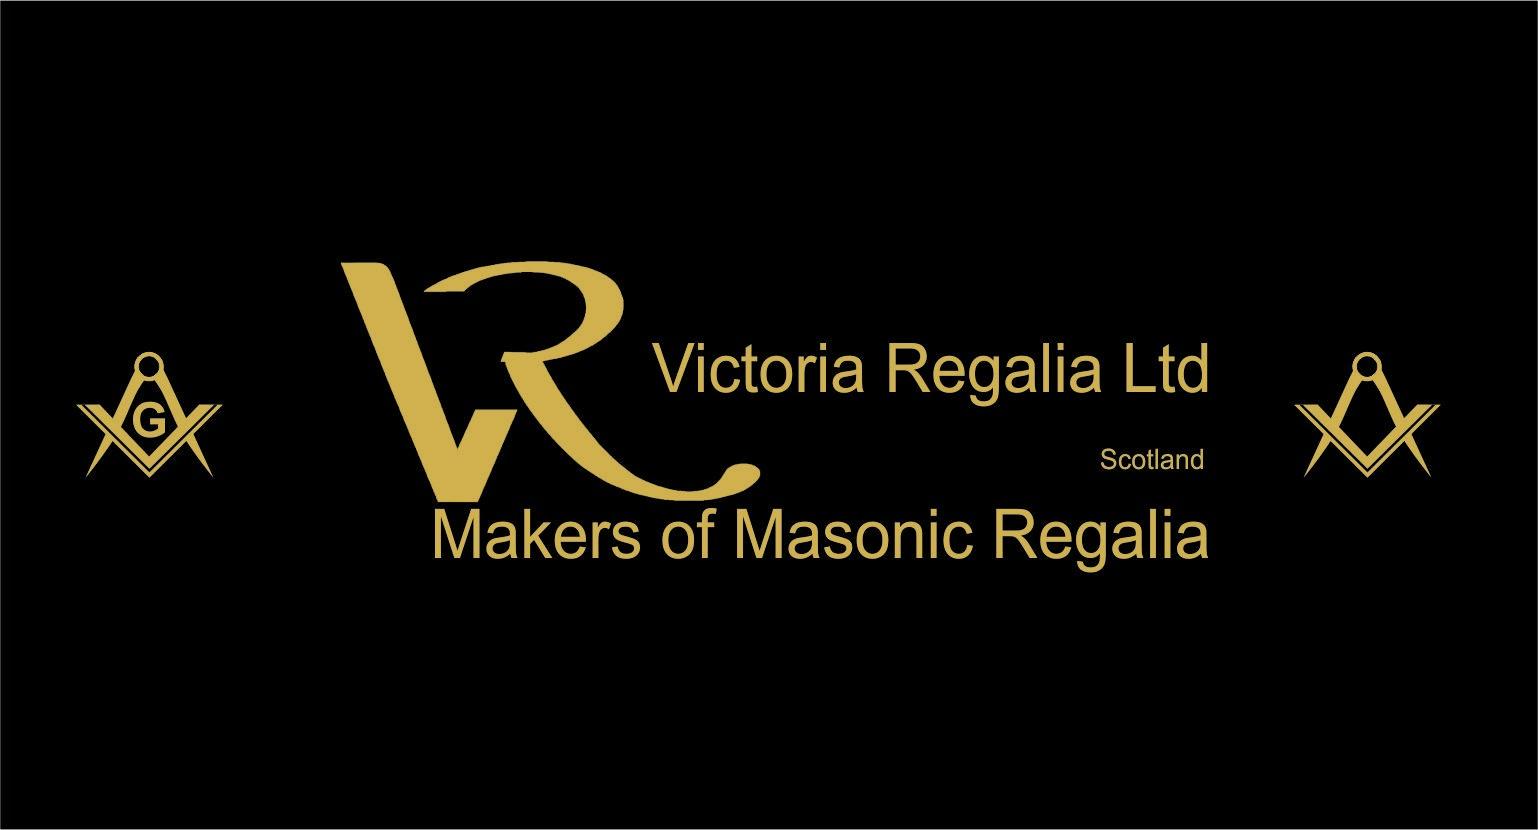 Victoria Regalia Ltd | LinkedIn